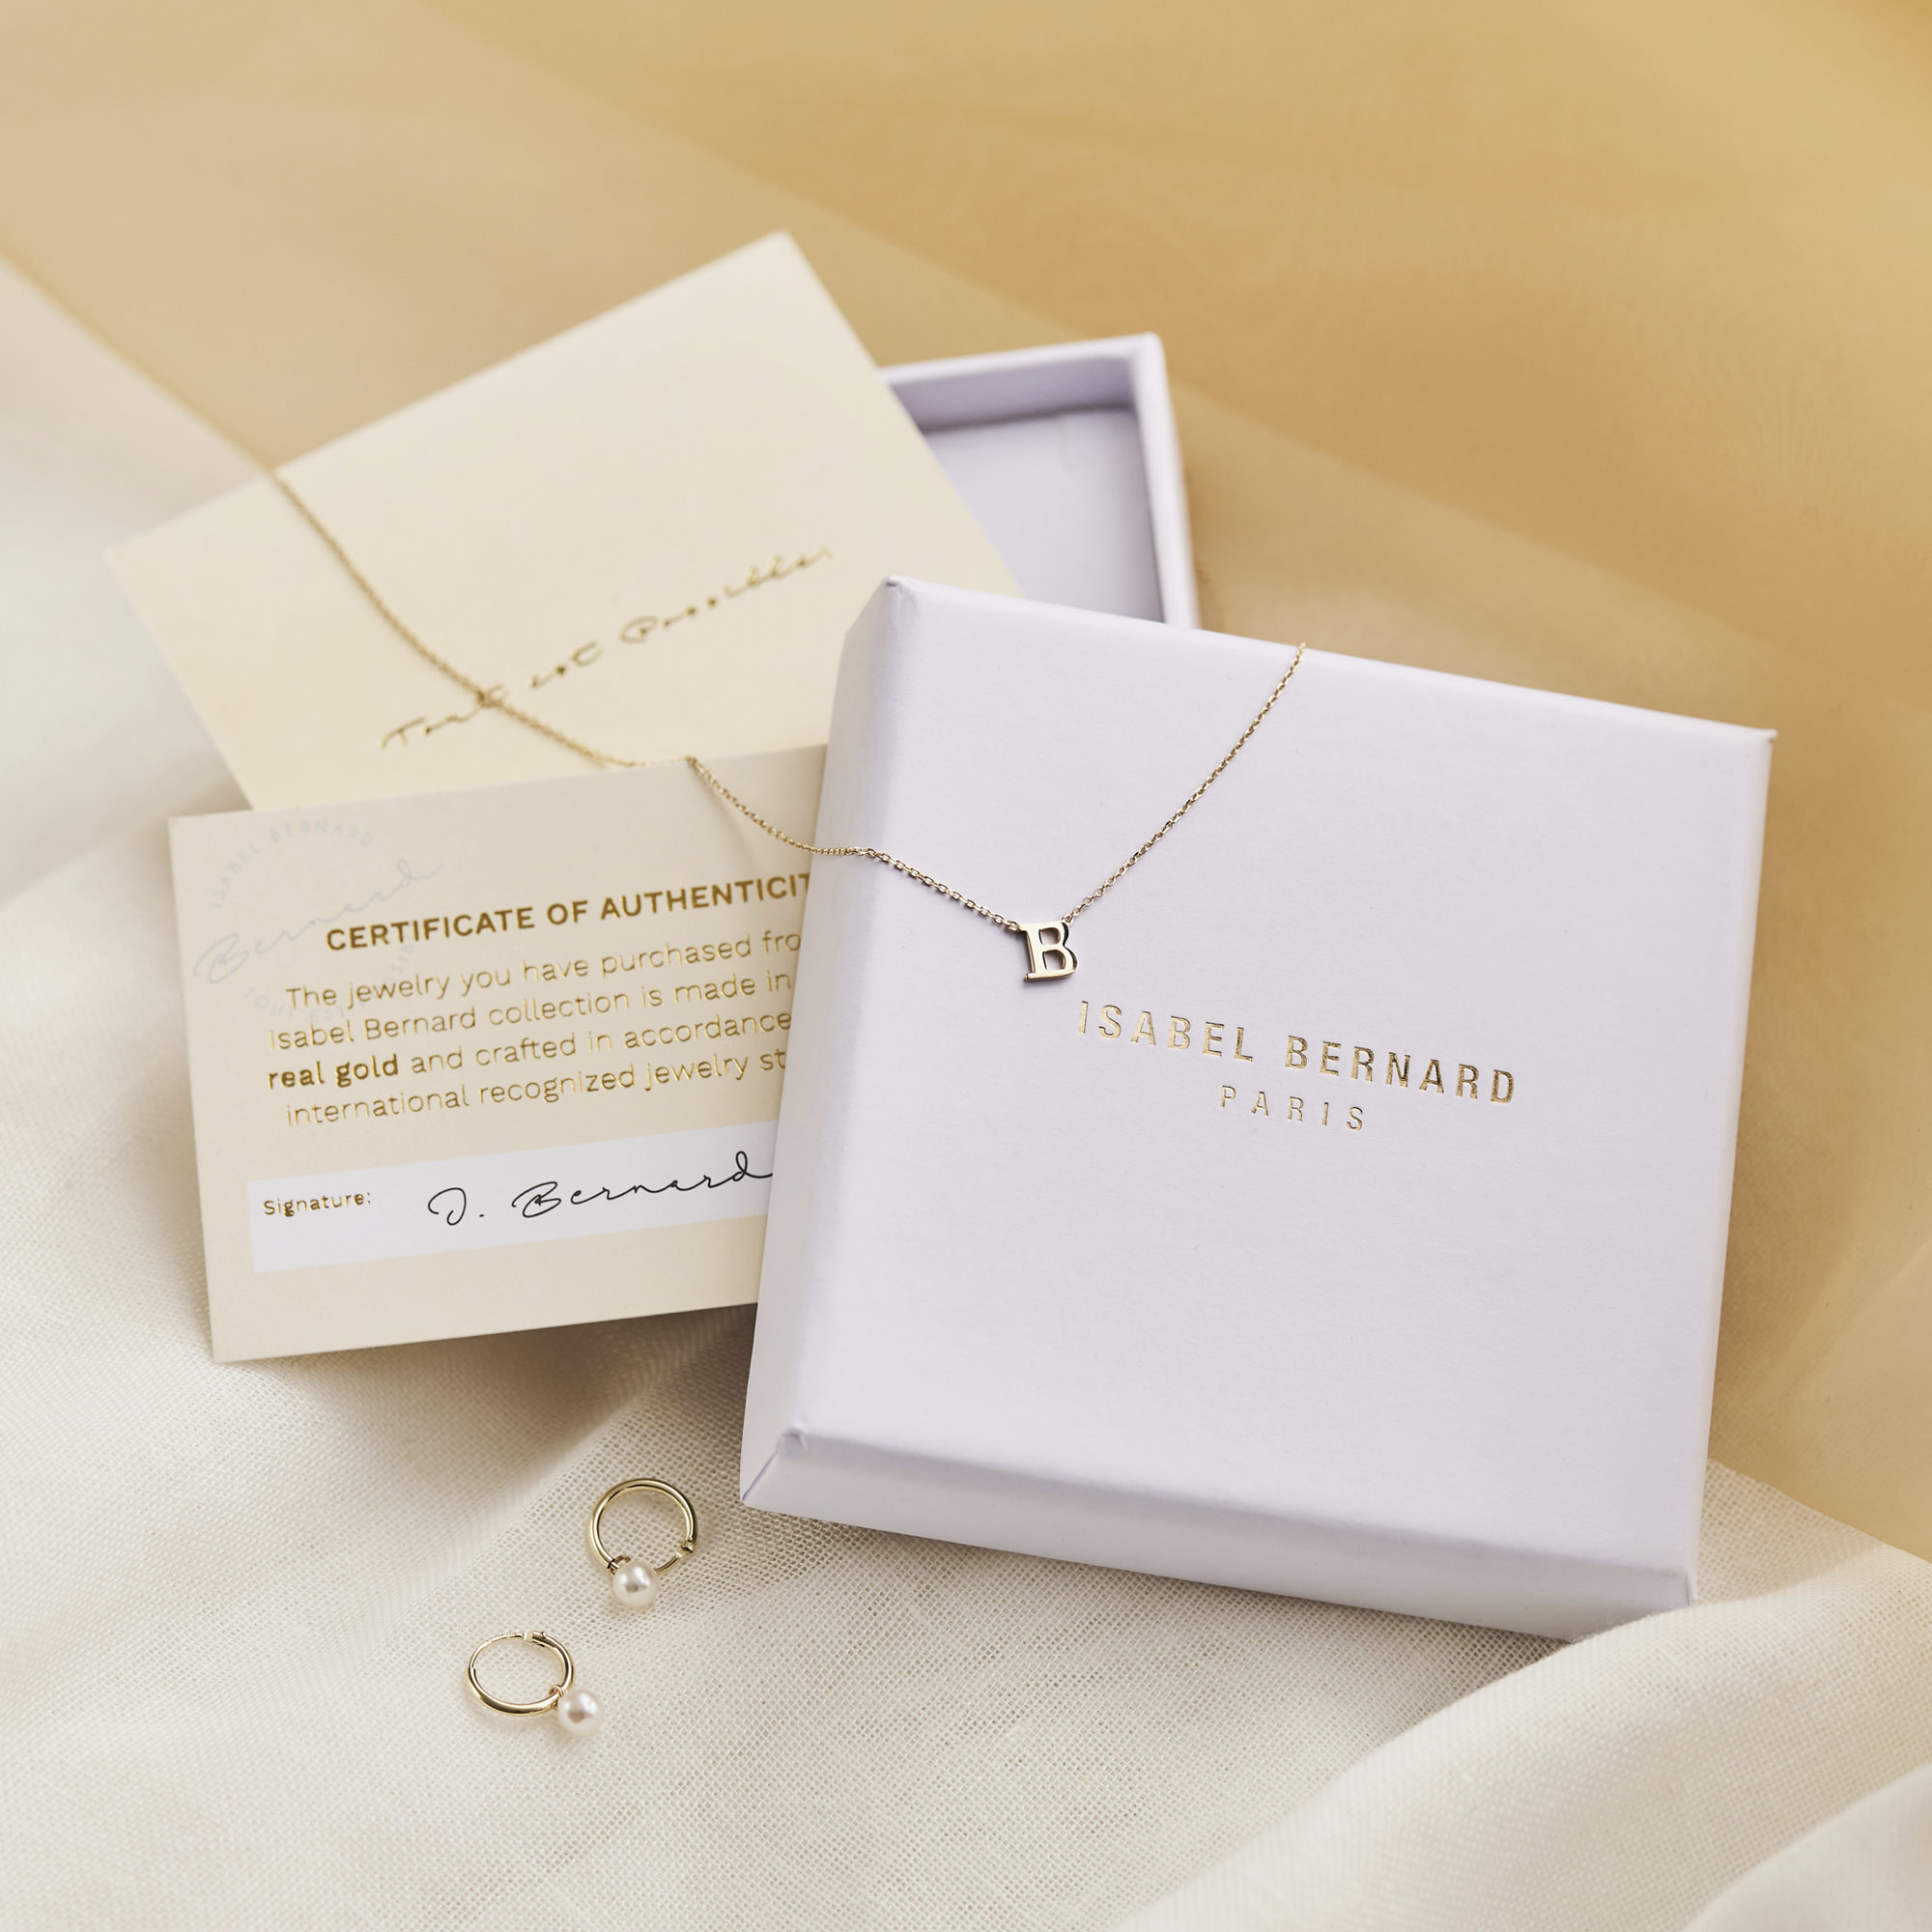 Isabel Bernard La Concorde Chloé collier initiale en or rose 14 carats